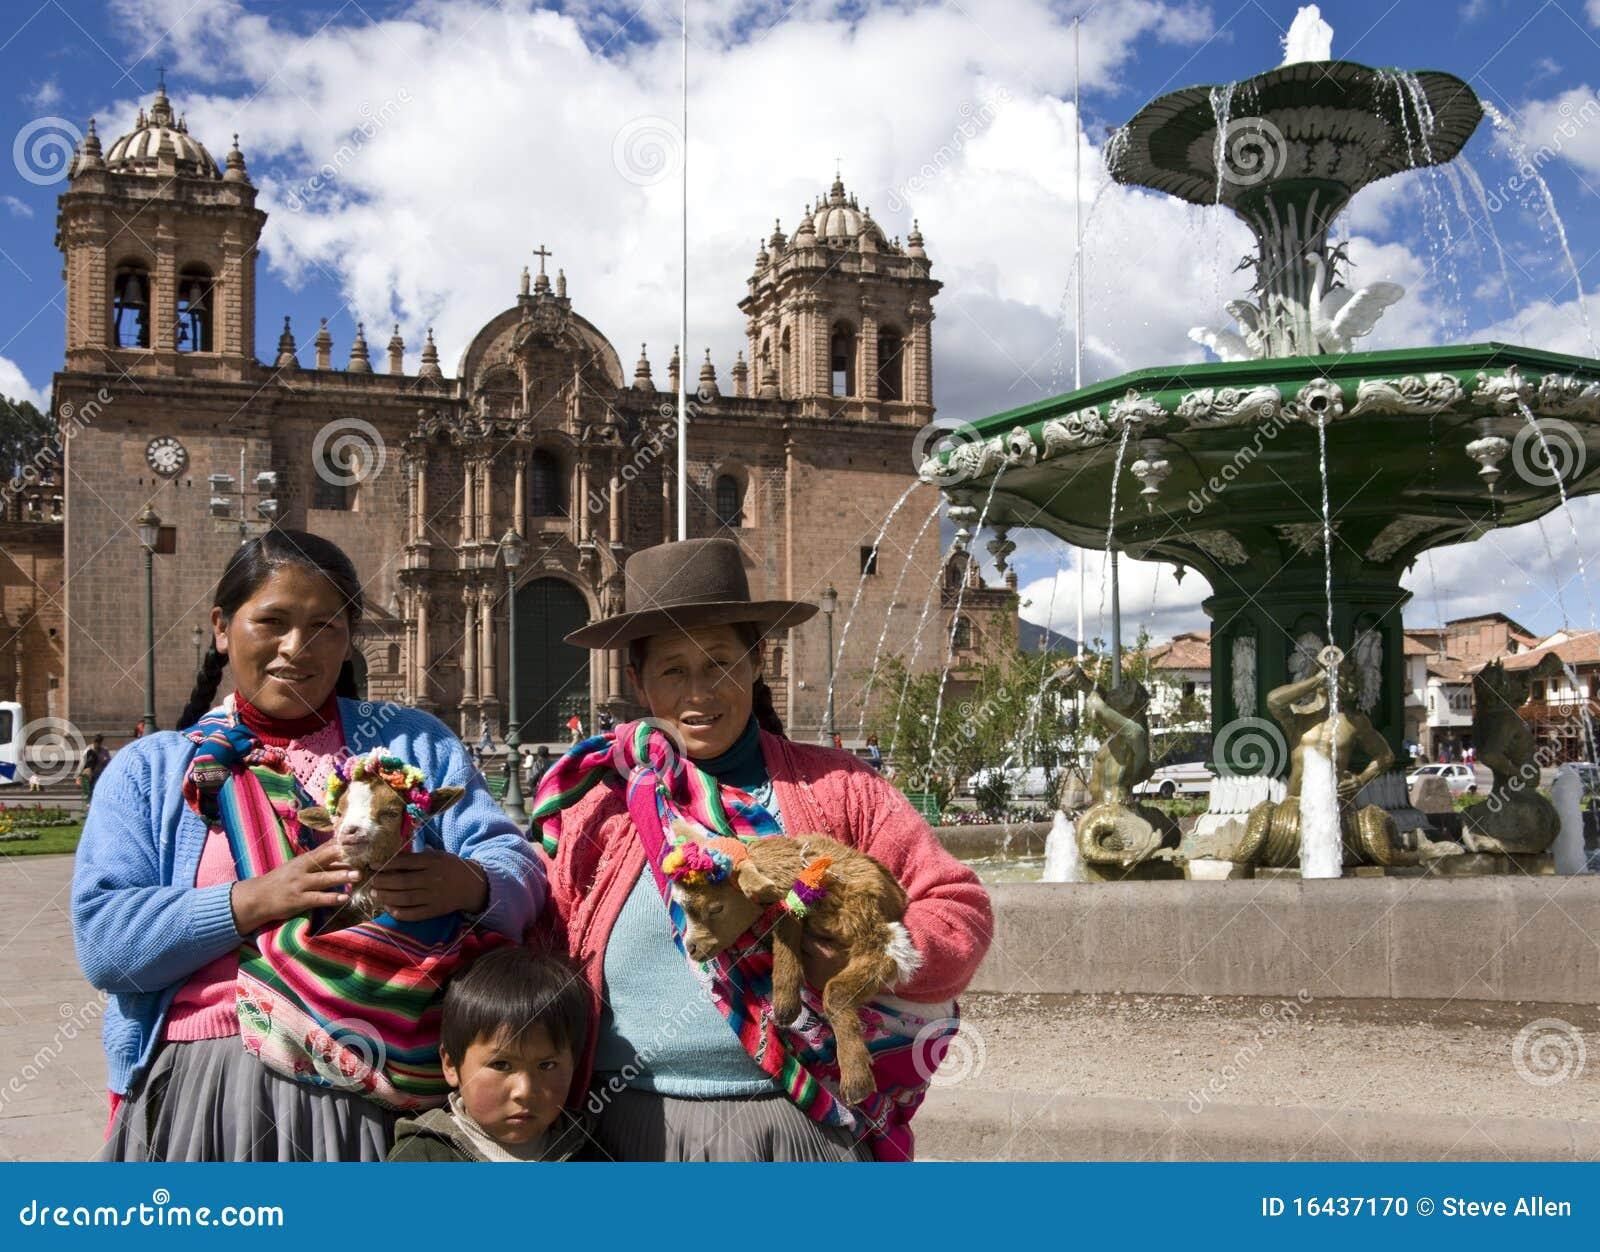 Cuzco - Local People - Peru Editorial Image - Image: 16437170